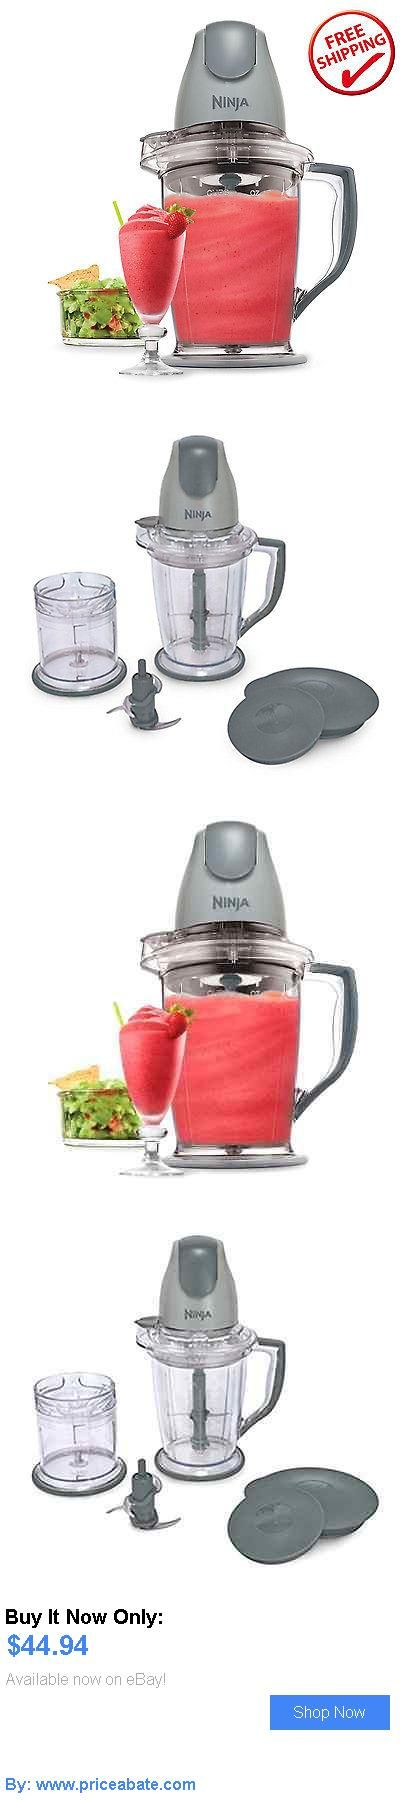 appliances: Ninja Master Prep Blender Food Processor Chopper Drink Mixer Smoothie Maker BUY IT NOW ONLY: $44.94 #priceabateappliances OR #priceabate